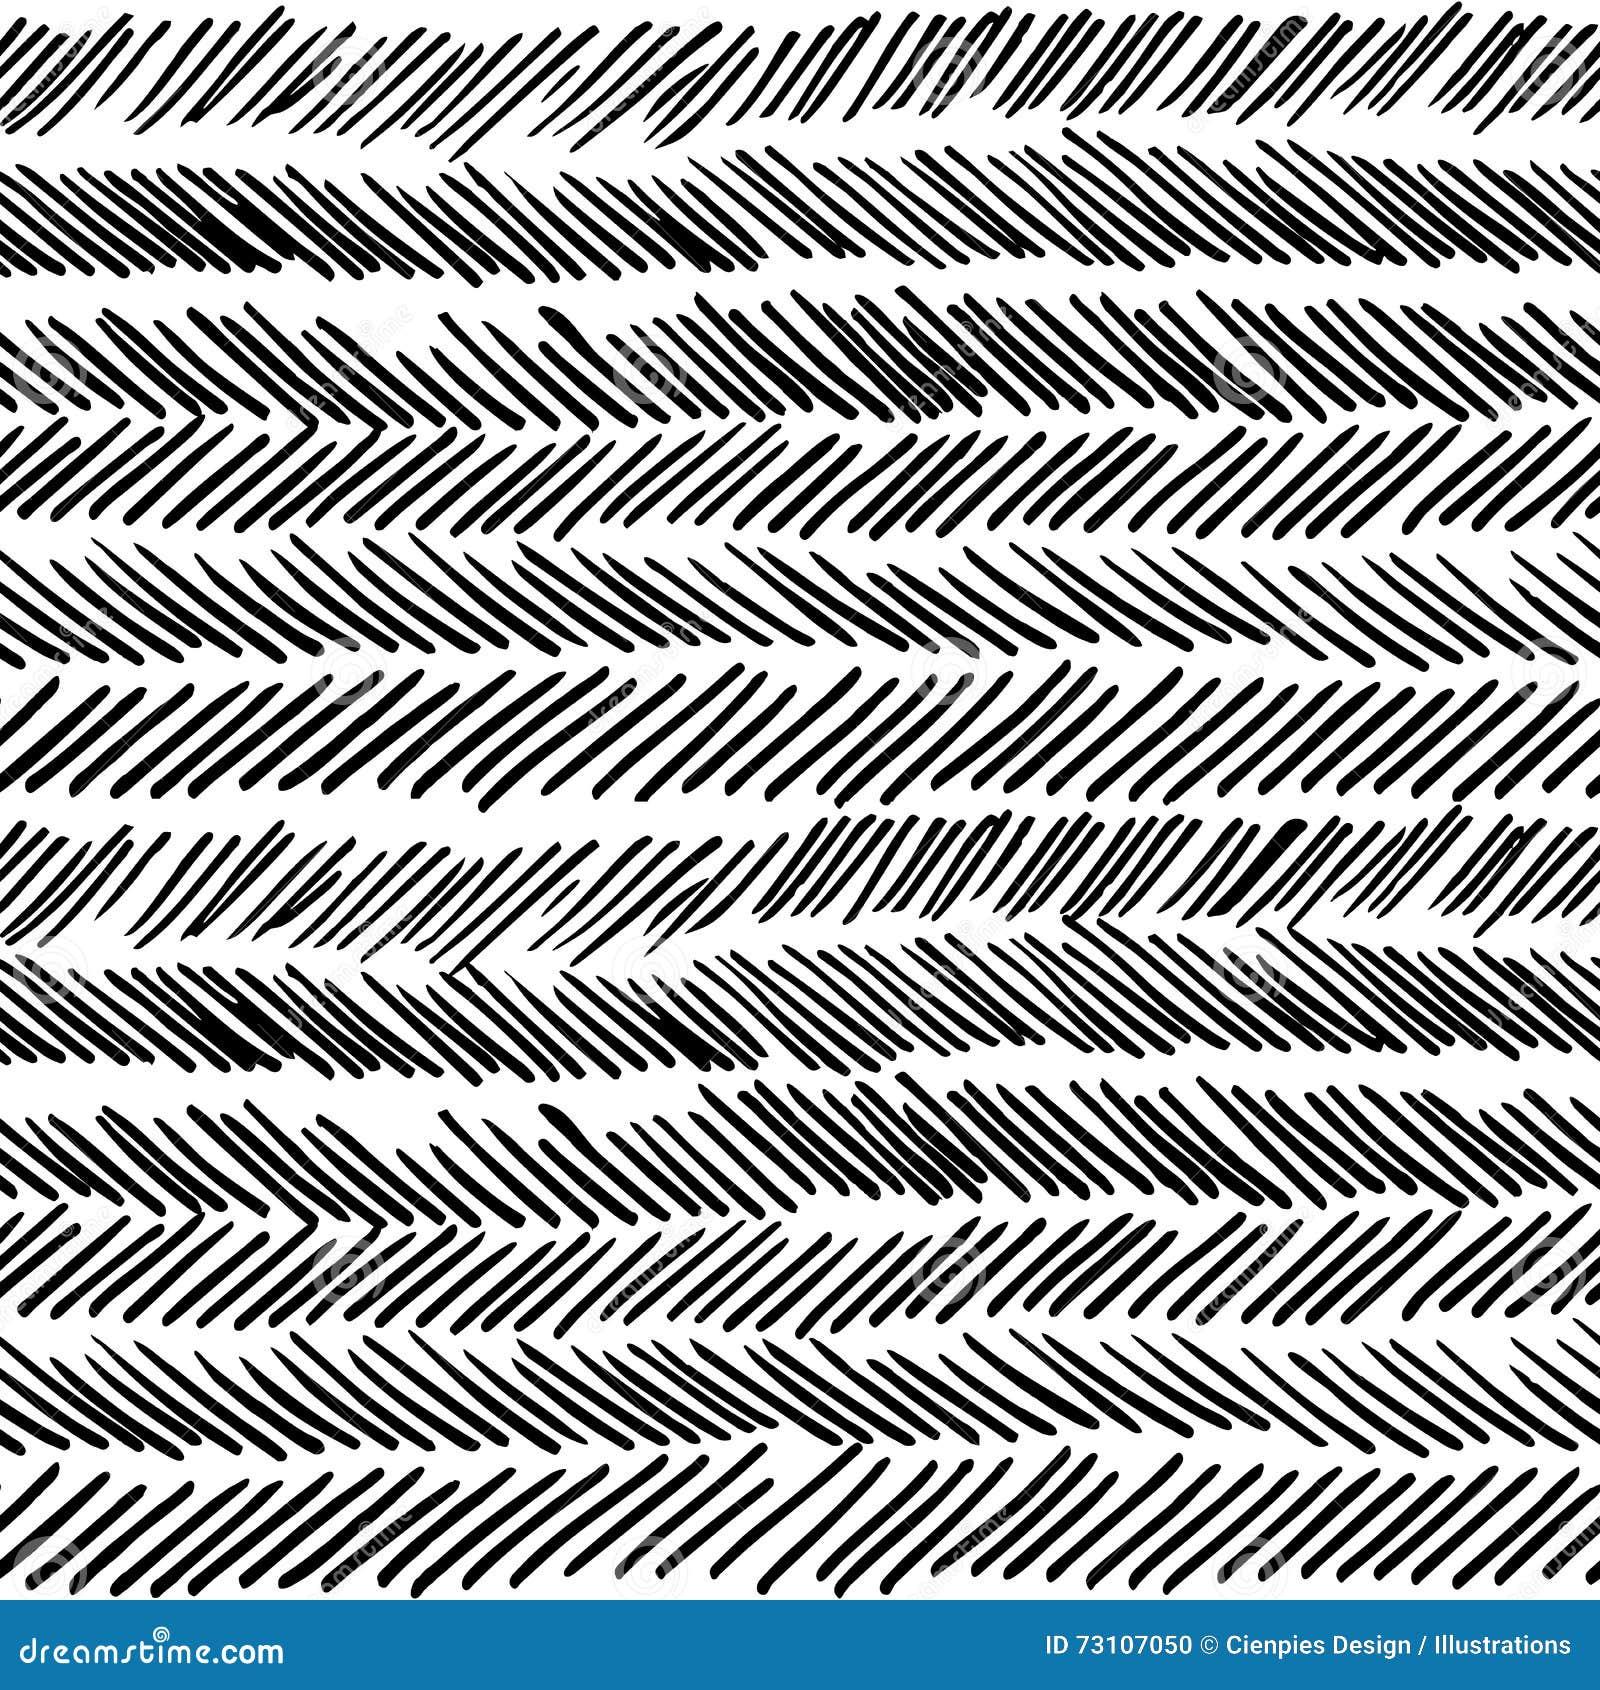 f5ccf15423b Stripe Black And White Boho Retro Seamless Pattern Stock Vector ...